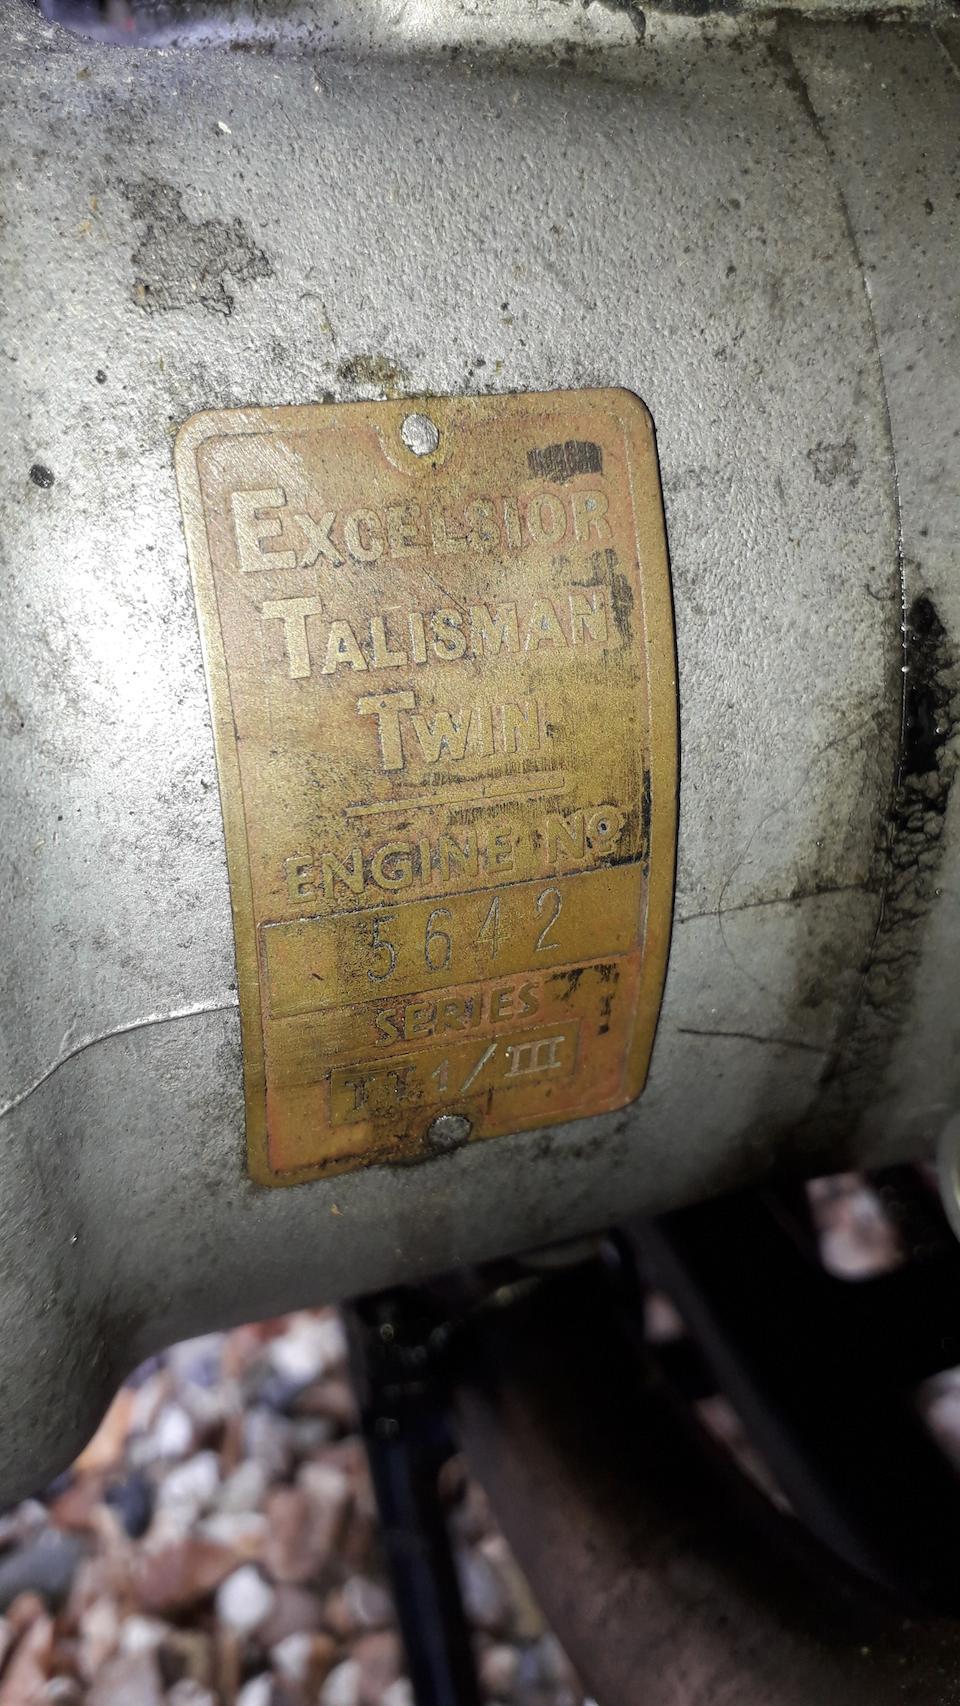 1955 Excelsior 243cc Talisman Twin Frame no. 5PT/134 Engine no. 5642